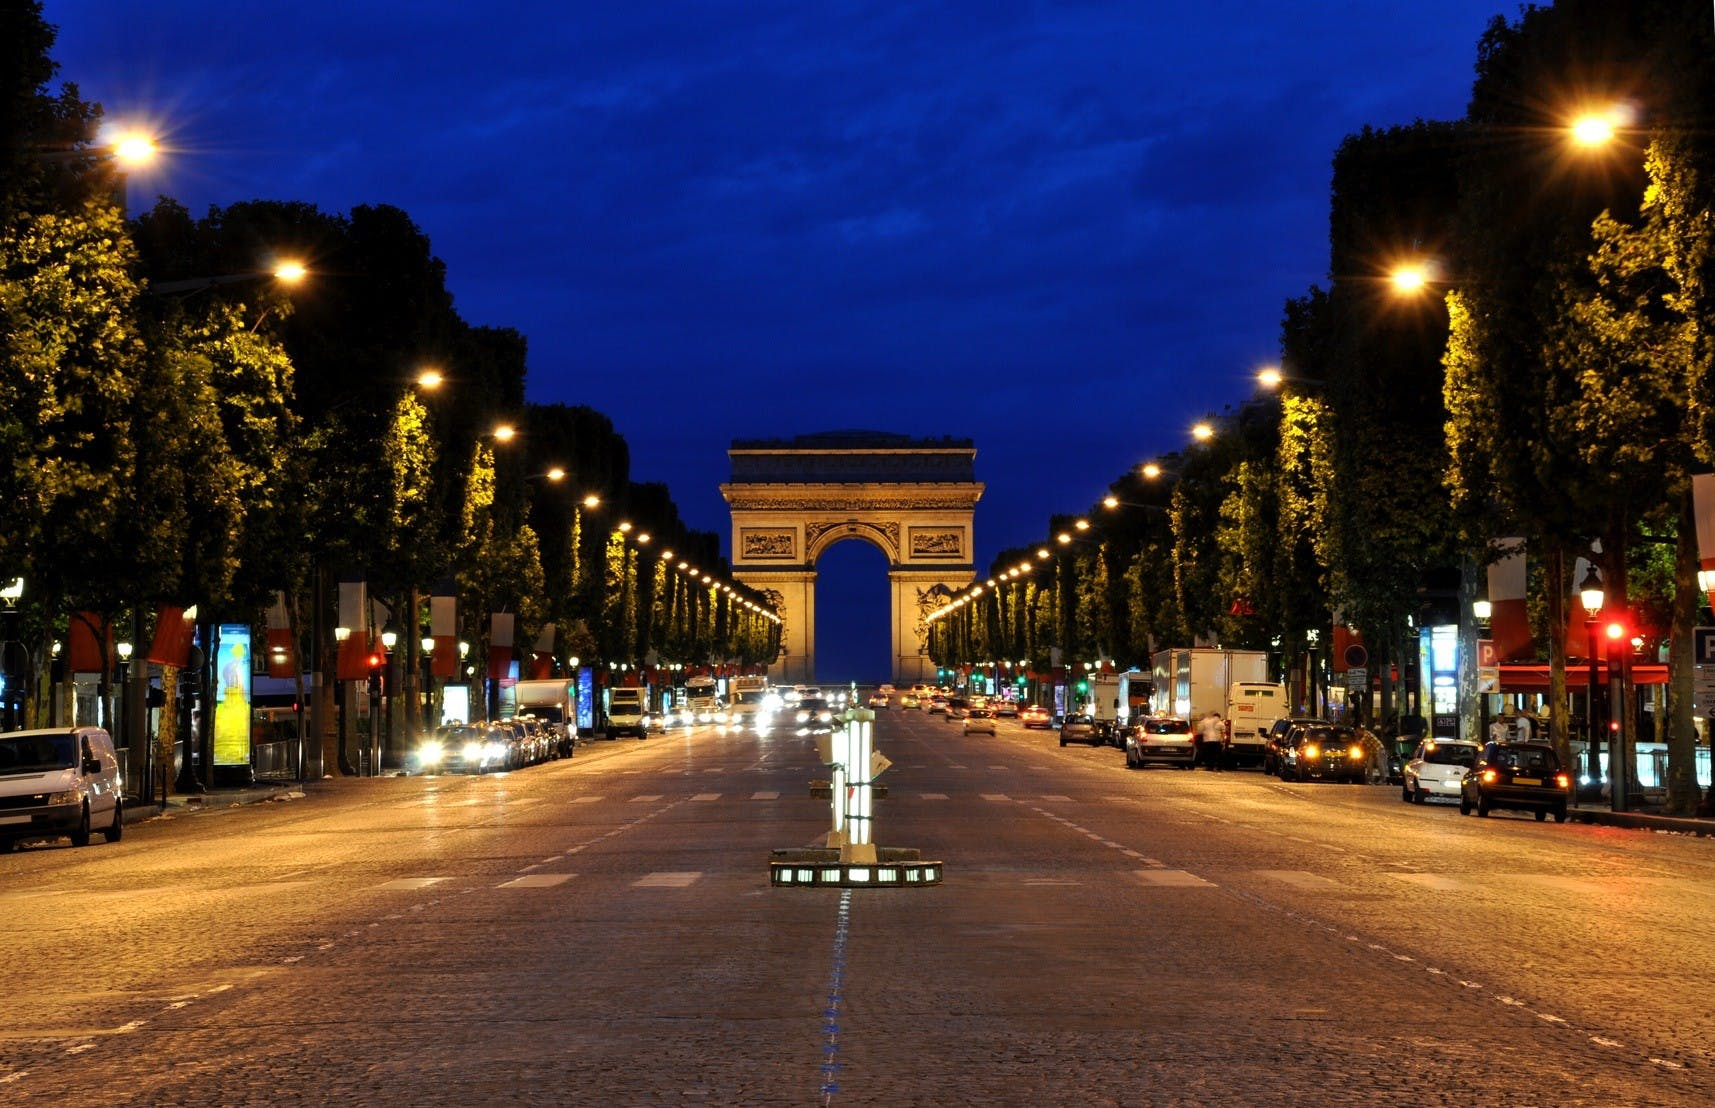 Arc de triomphe Paris by Night.jpg